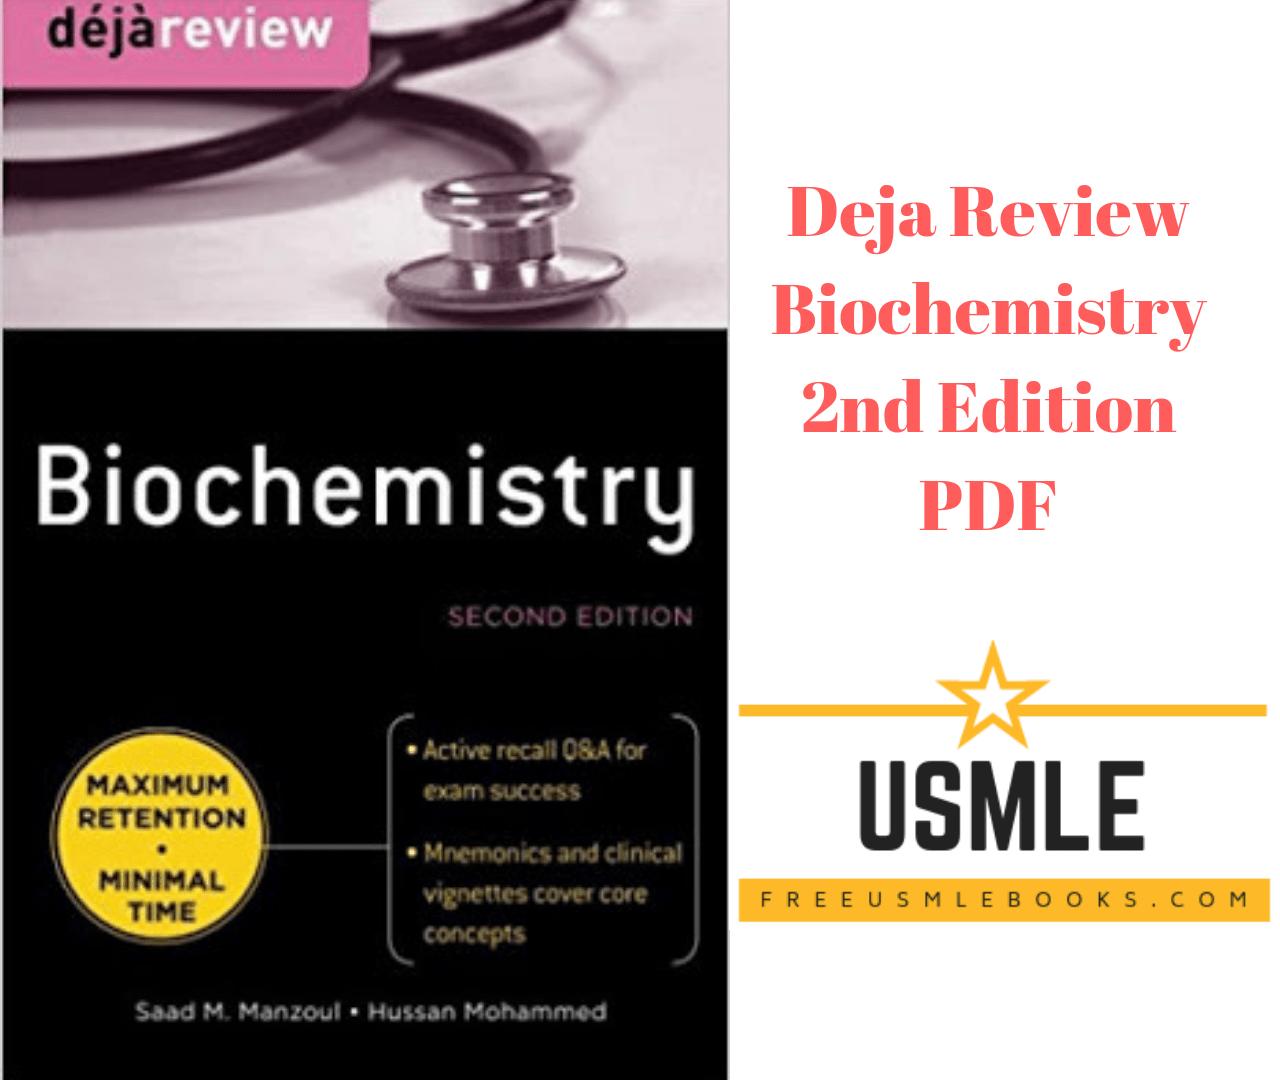 deja review biochemistry pdf free download